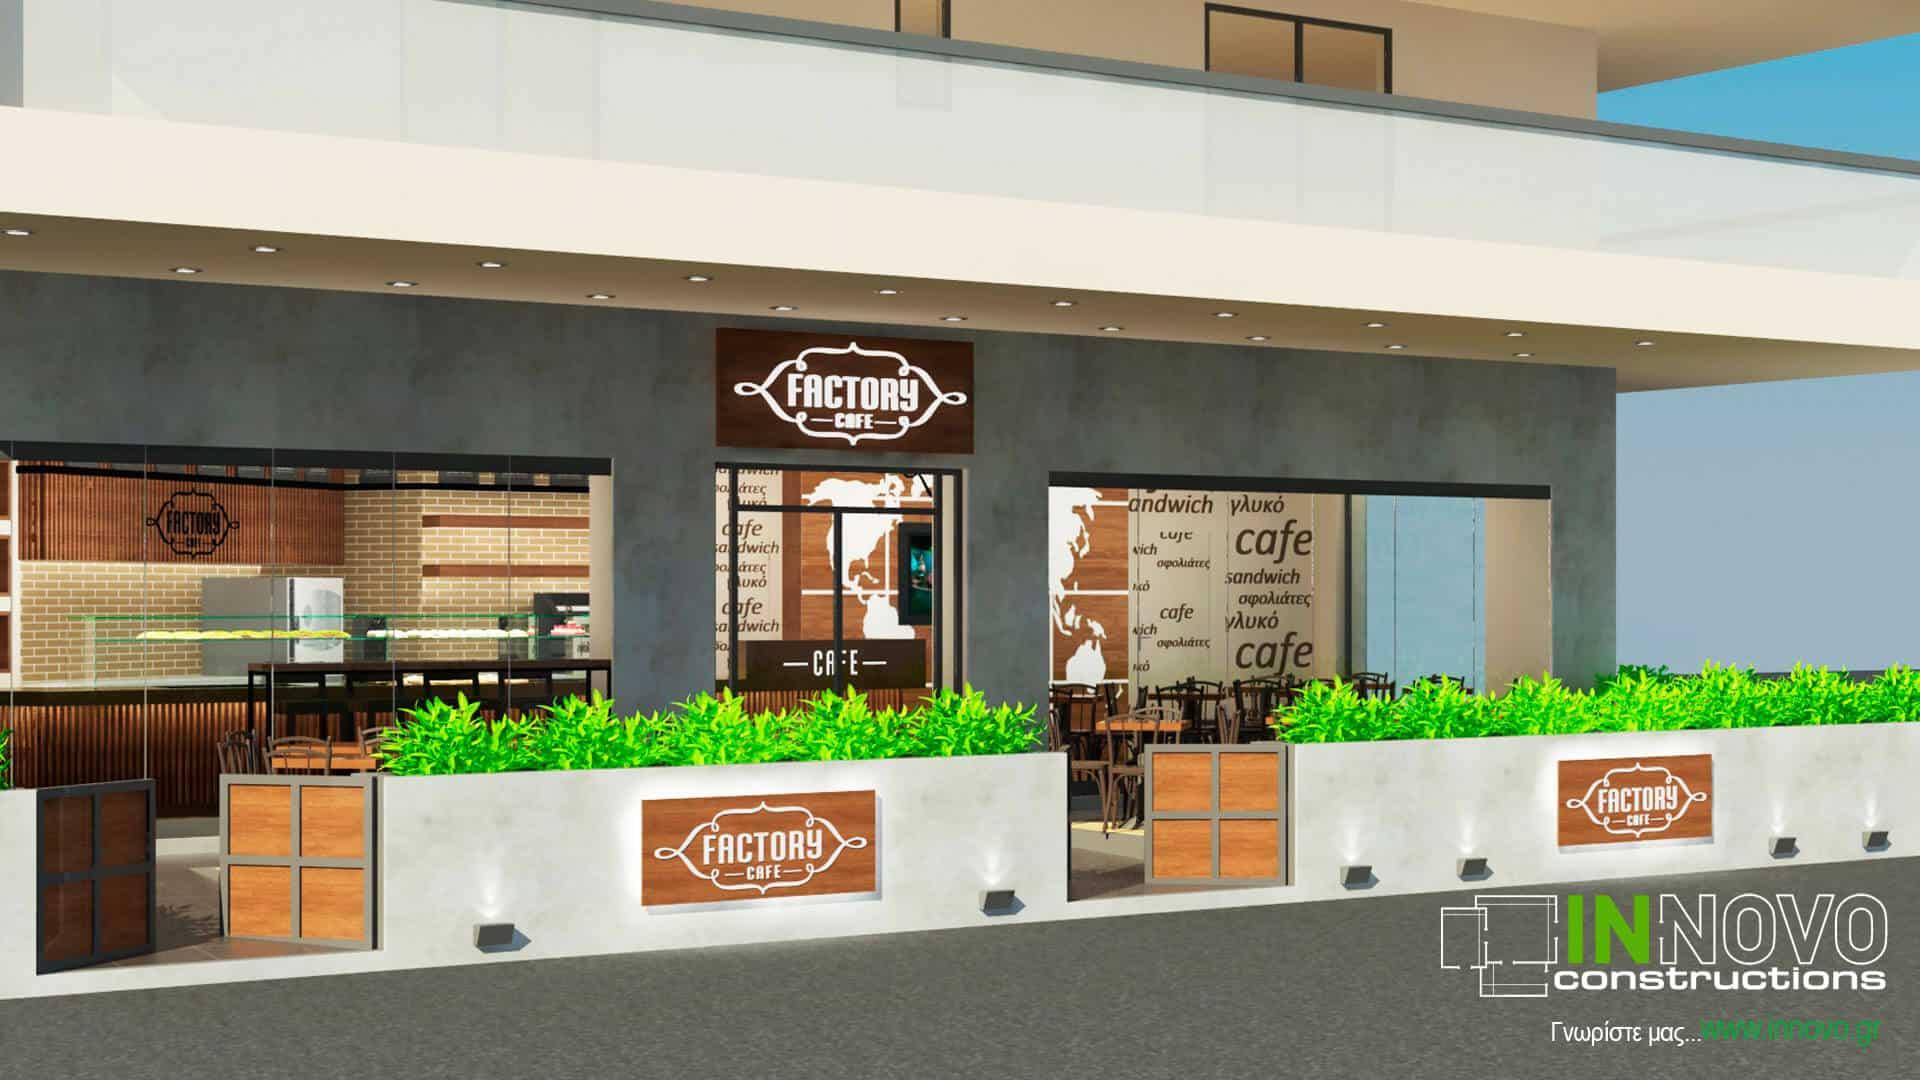 kataskevi-snack-cafe-construction-snack-gerakas-1842-14